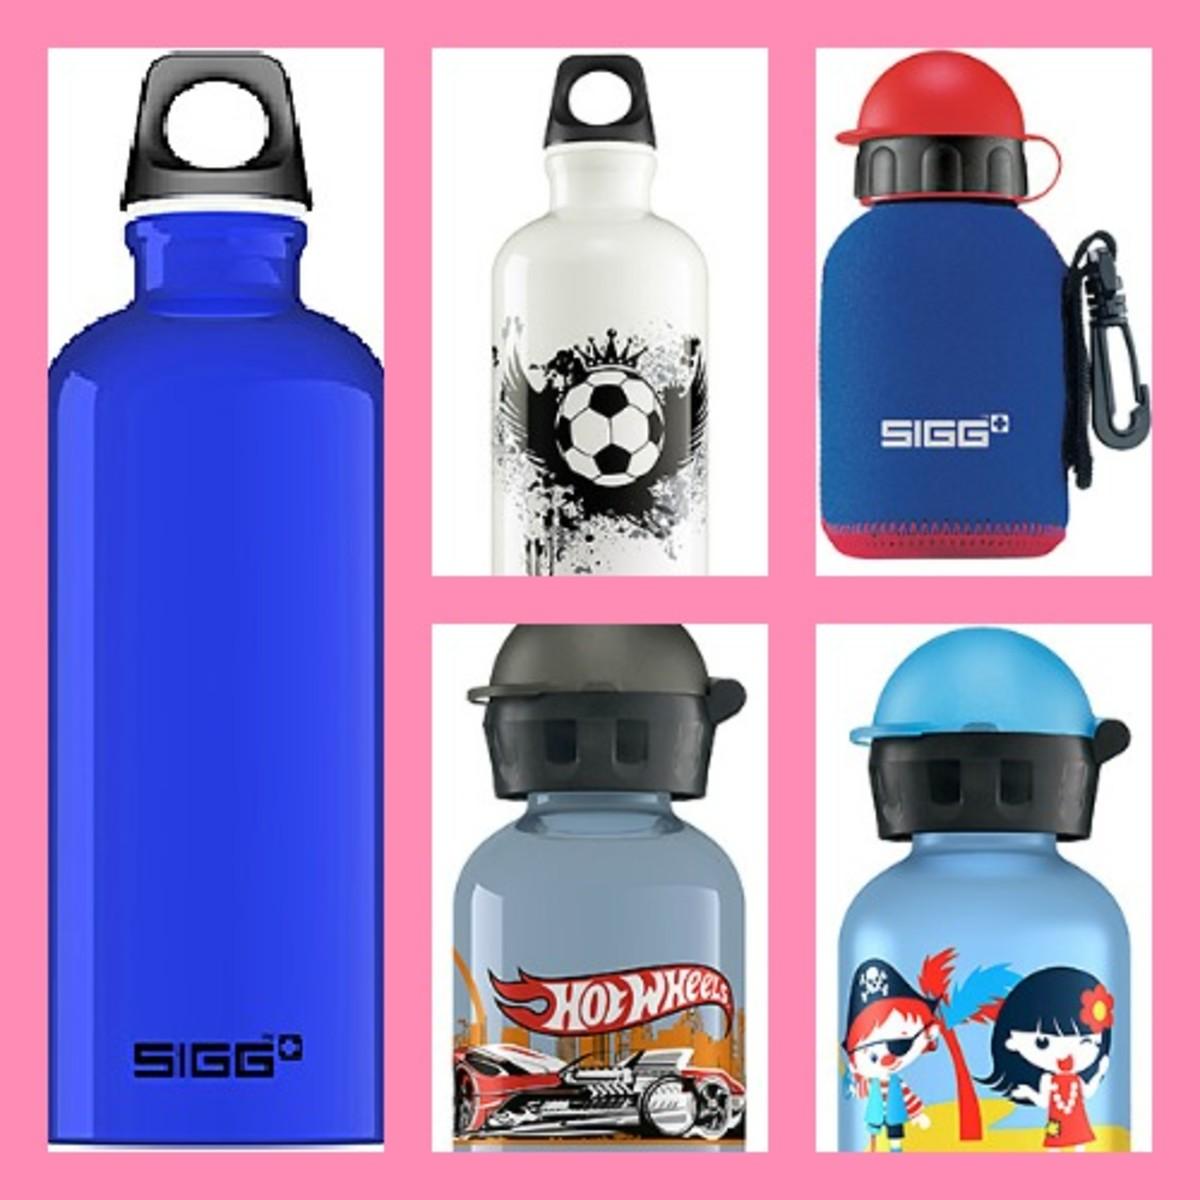 SIGG-bottles-